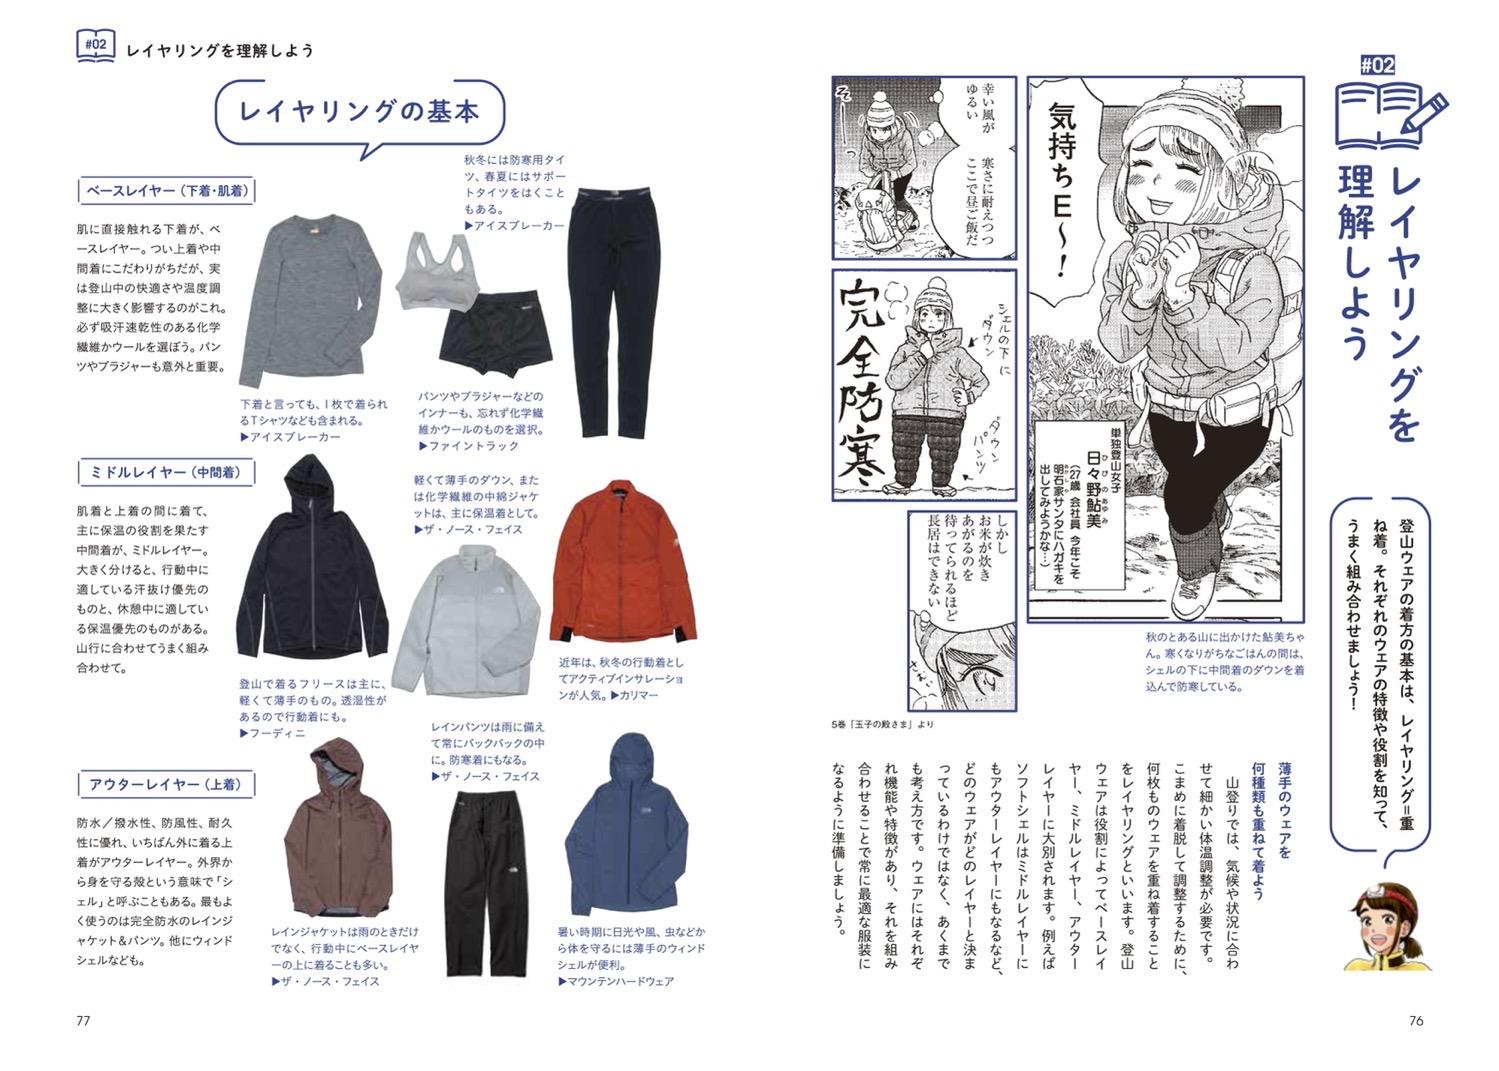 Yamashoku ayumi book 9 03 04